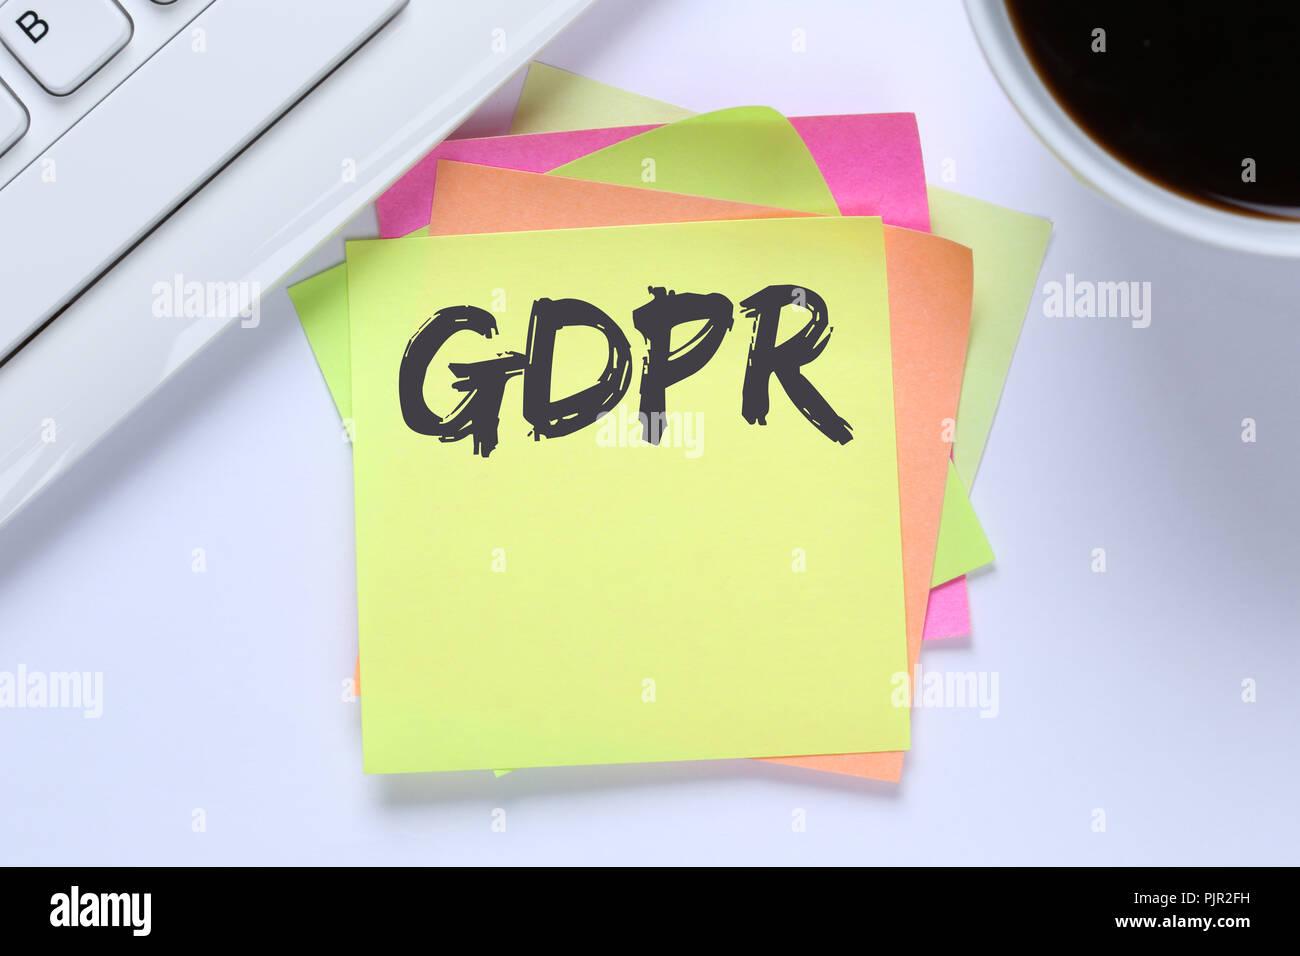 GDPR General Data Protection Regulation EU European Union websites internet office desk computer keyboard - Stock Image